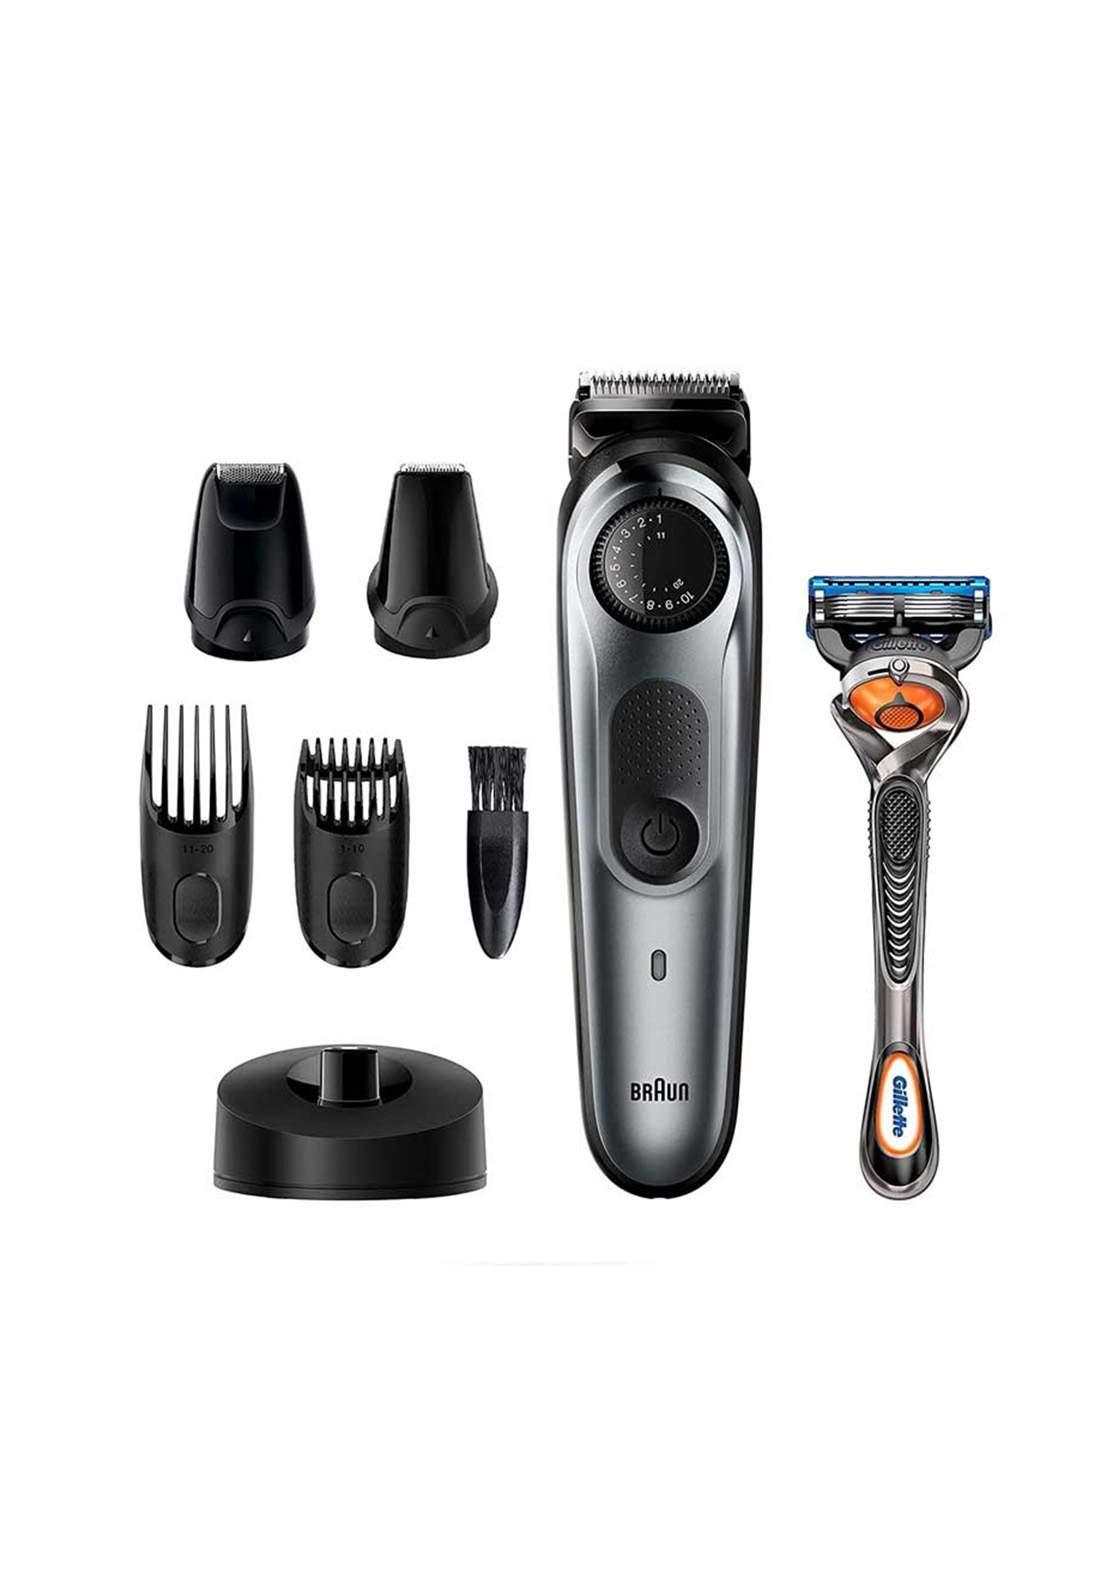 Braun Grooming BT7240 / Beard Trimmer 7   ماكنة حلاقة رجالية